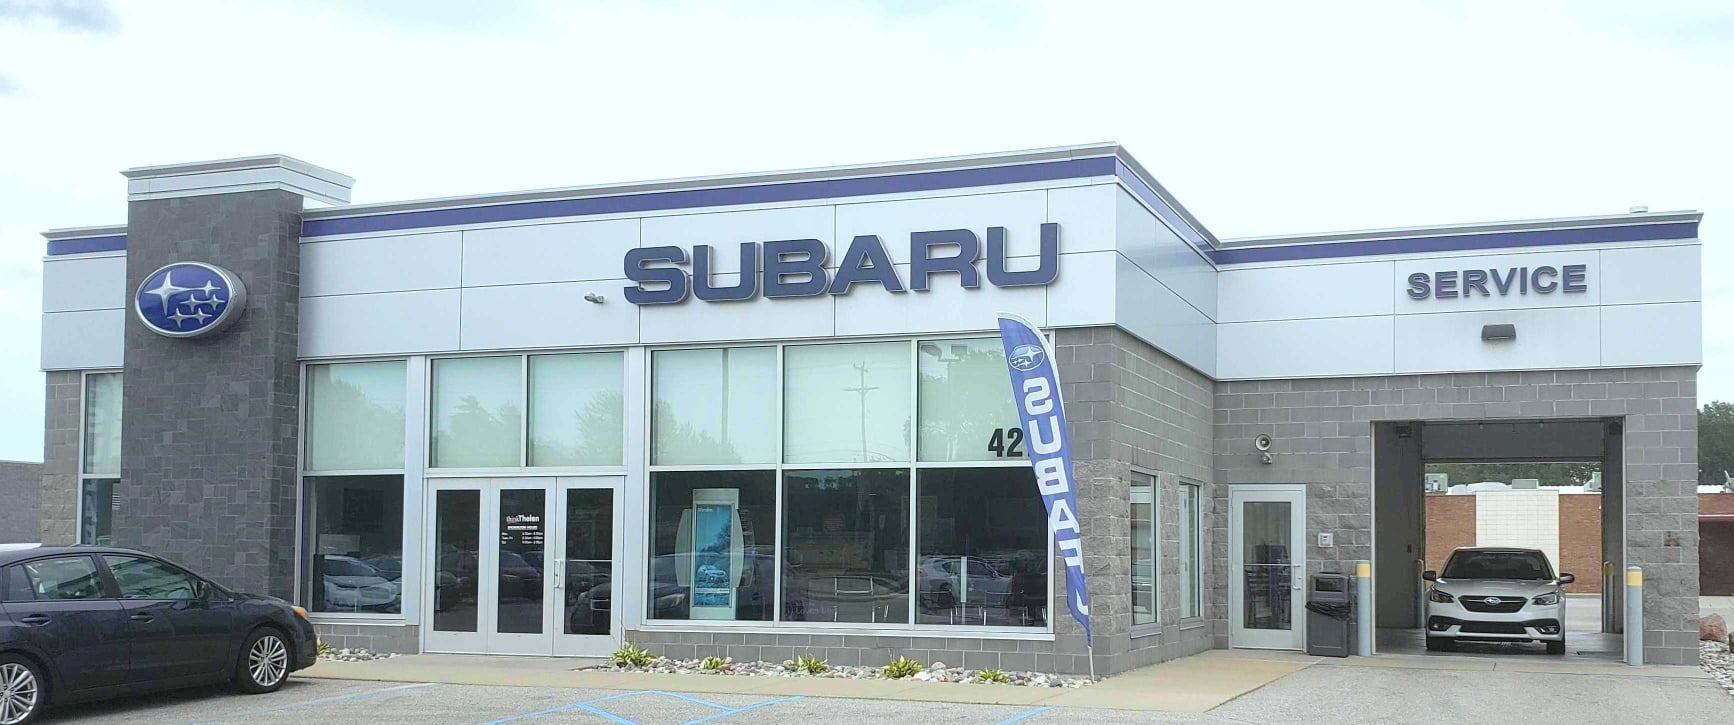 New Service Bay and Specials at Thelen Subaru in Bay City, MI